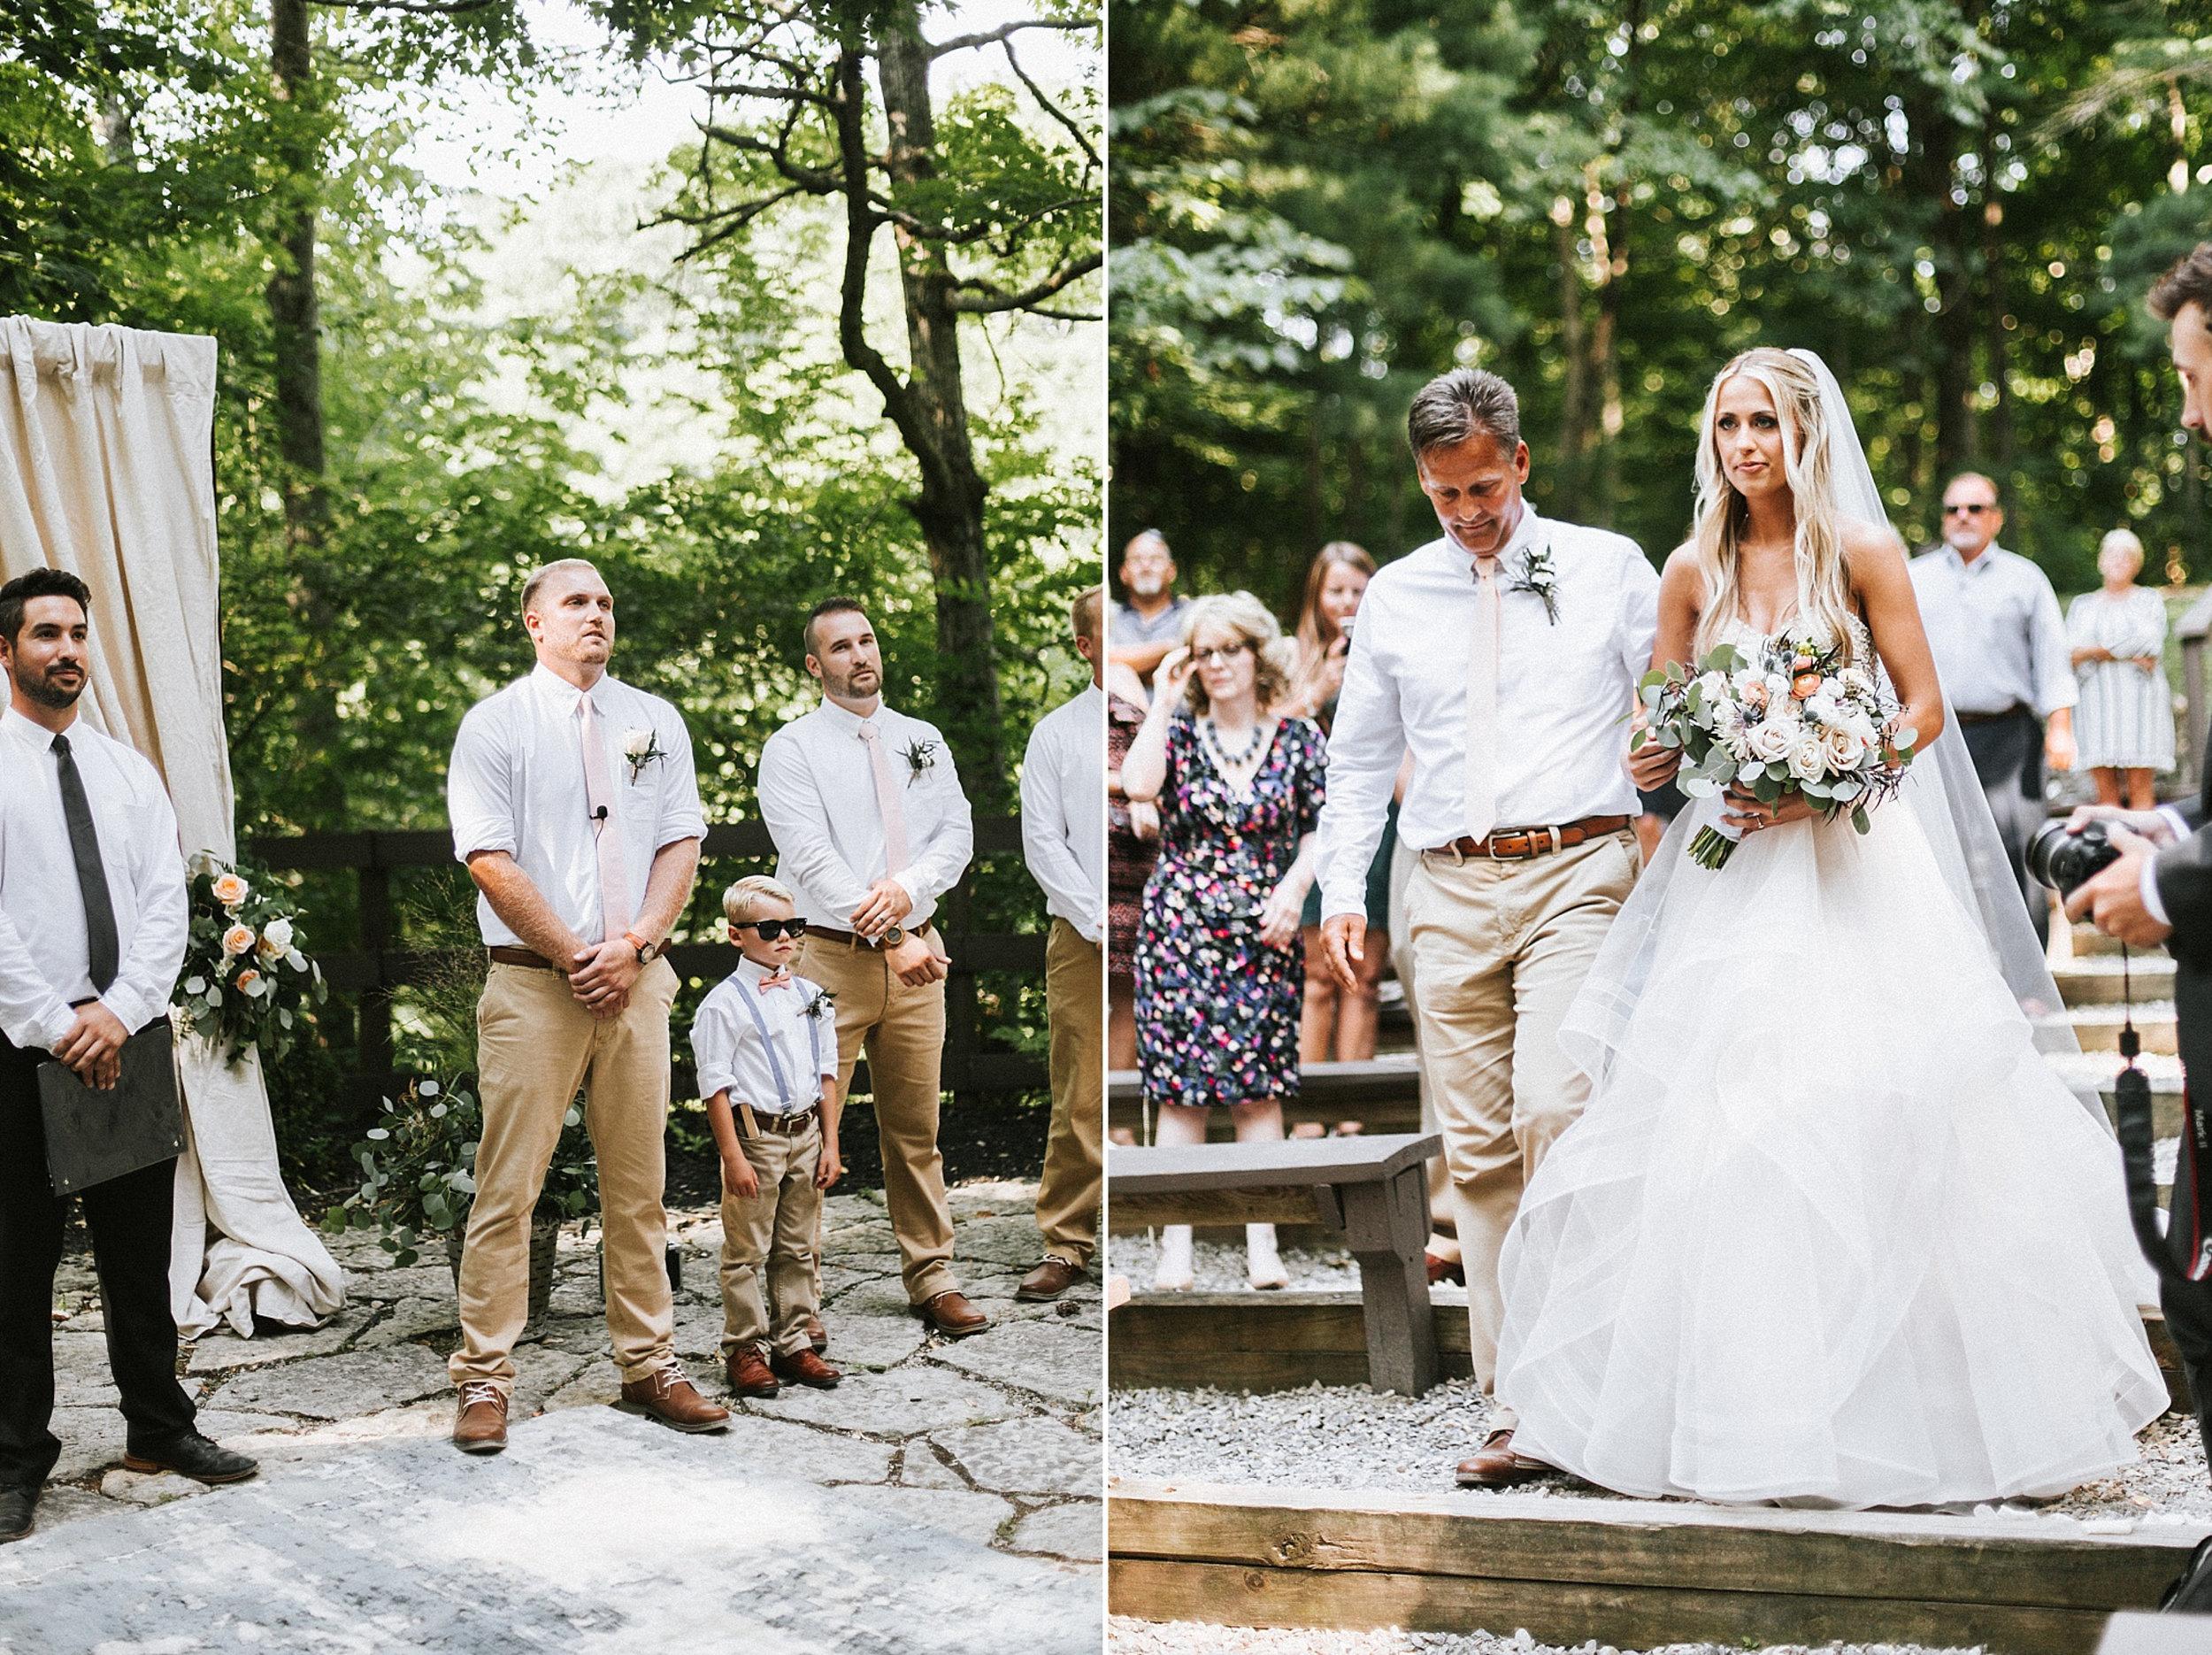 Brooke Townsend Photography - Cincinnati Wedding Photographer (64 of 153).jpg